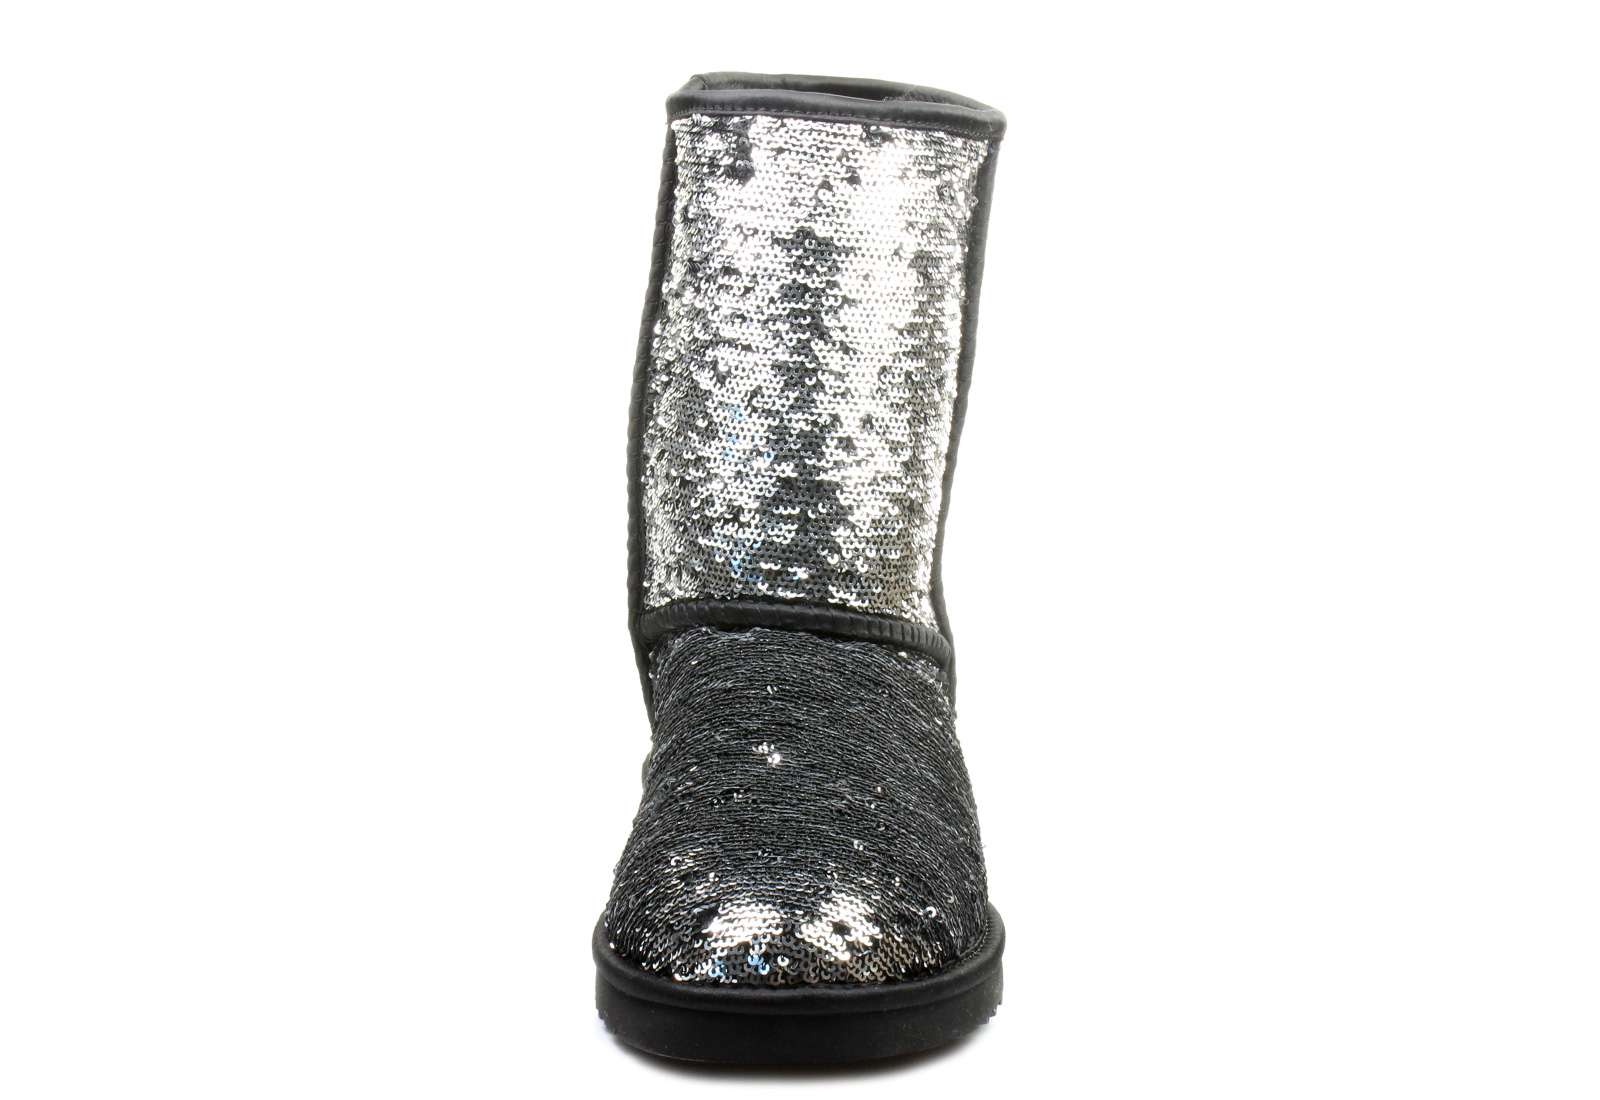 Ugg Csizma - W Classic Short Sparkles - 1002765-BLM - Office Shoes ... adb5065d8d